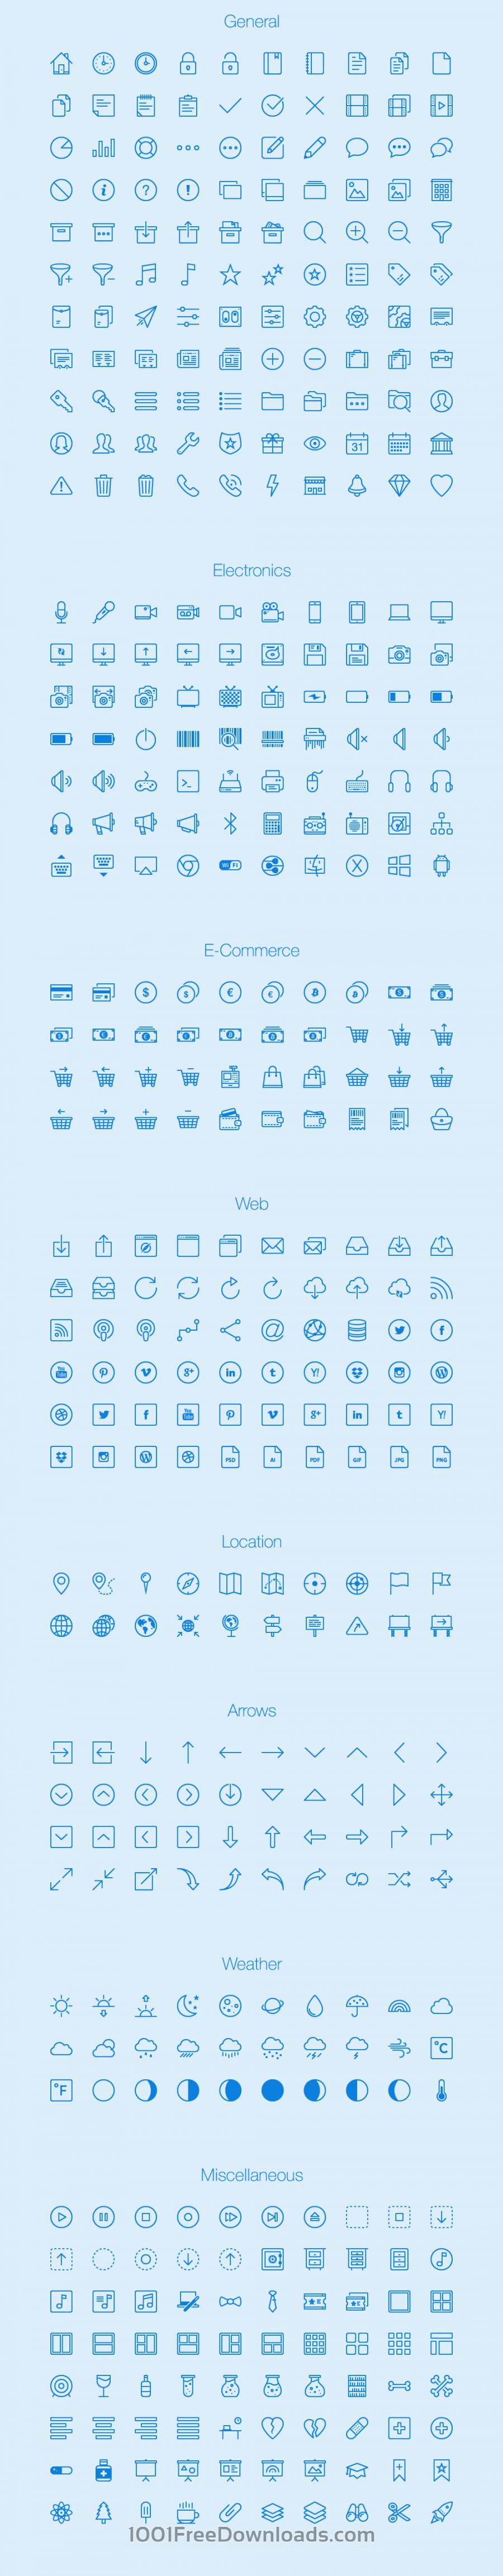 Free Vectors: Lynny Icons - Full | Icons